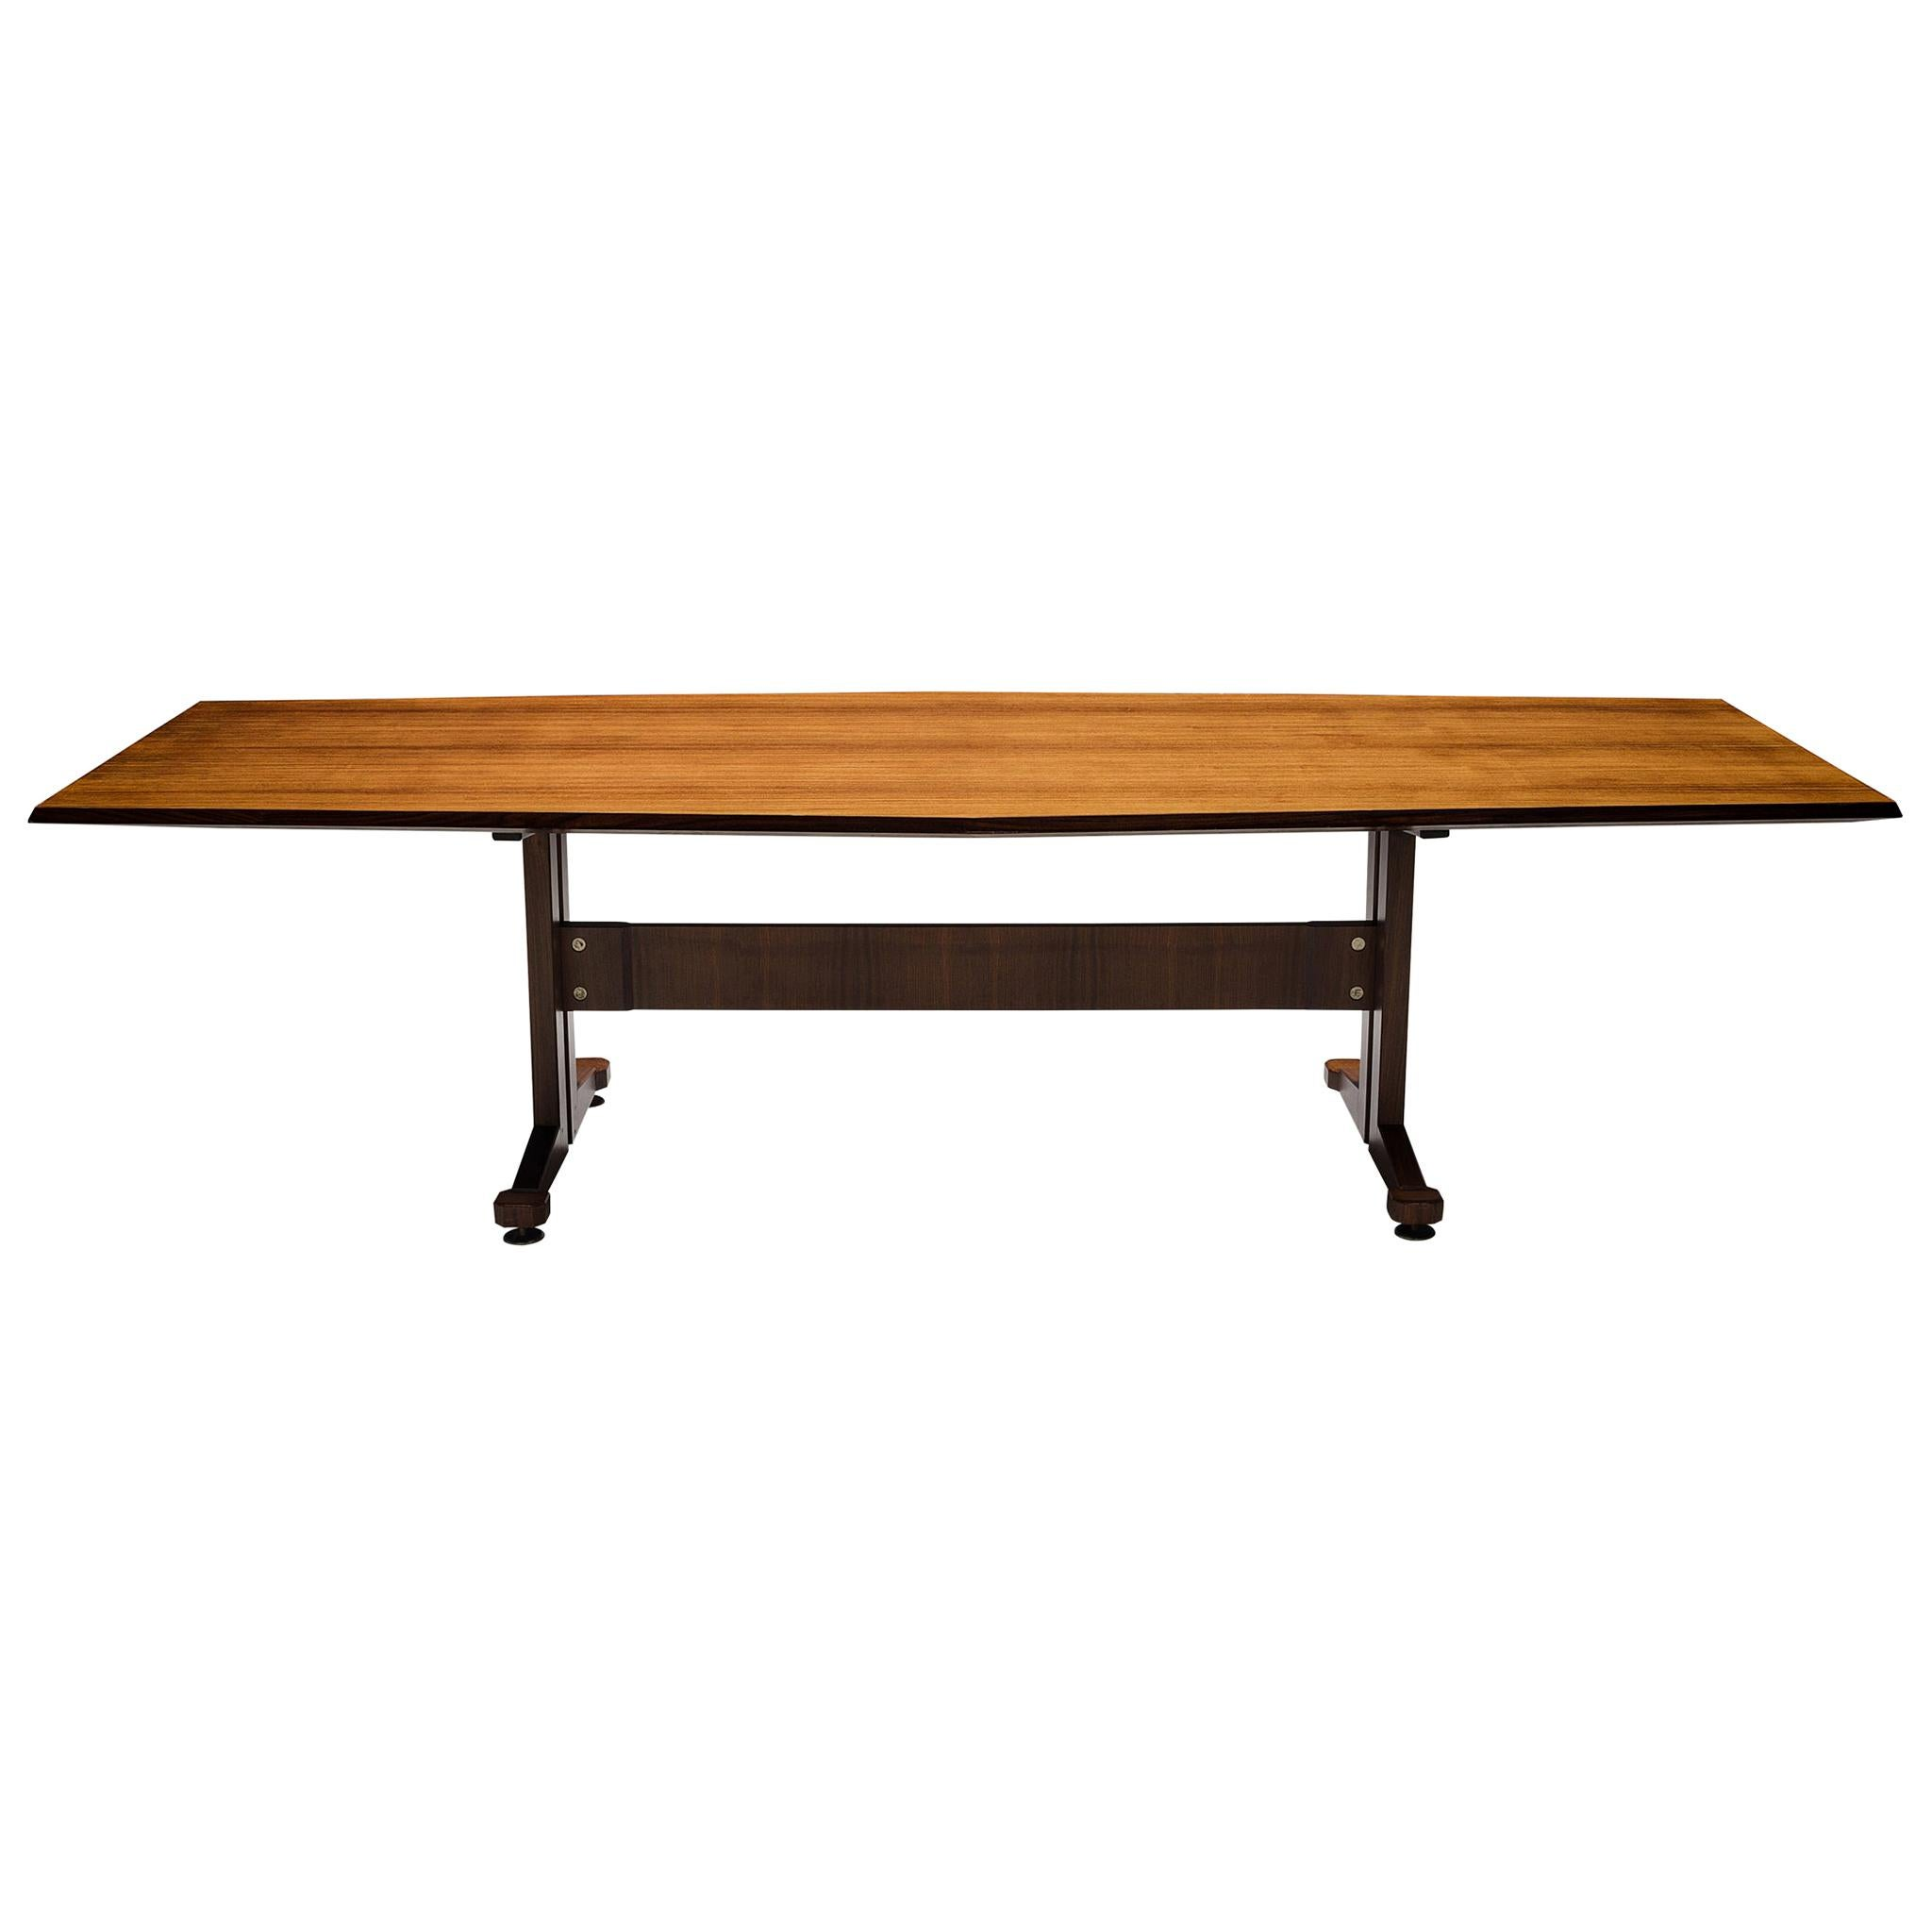 Large Italian Boat-Shaped Table in Teak